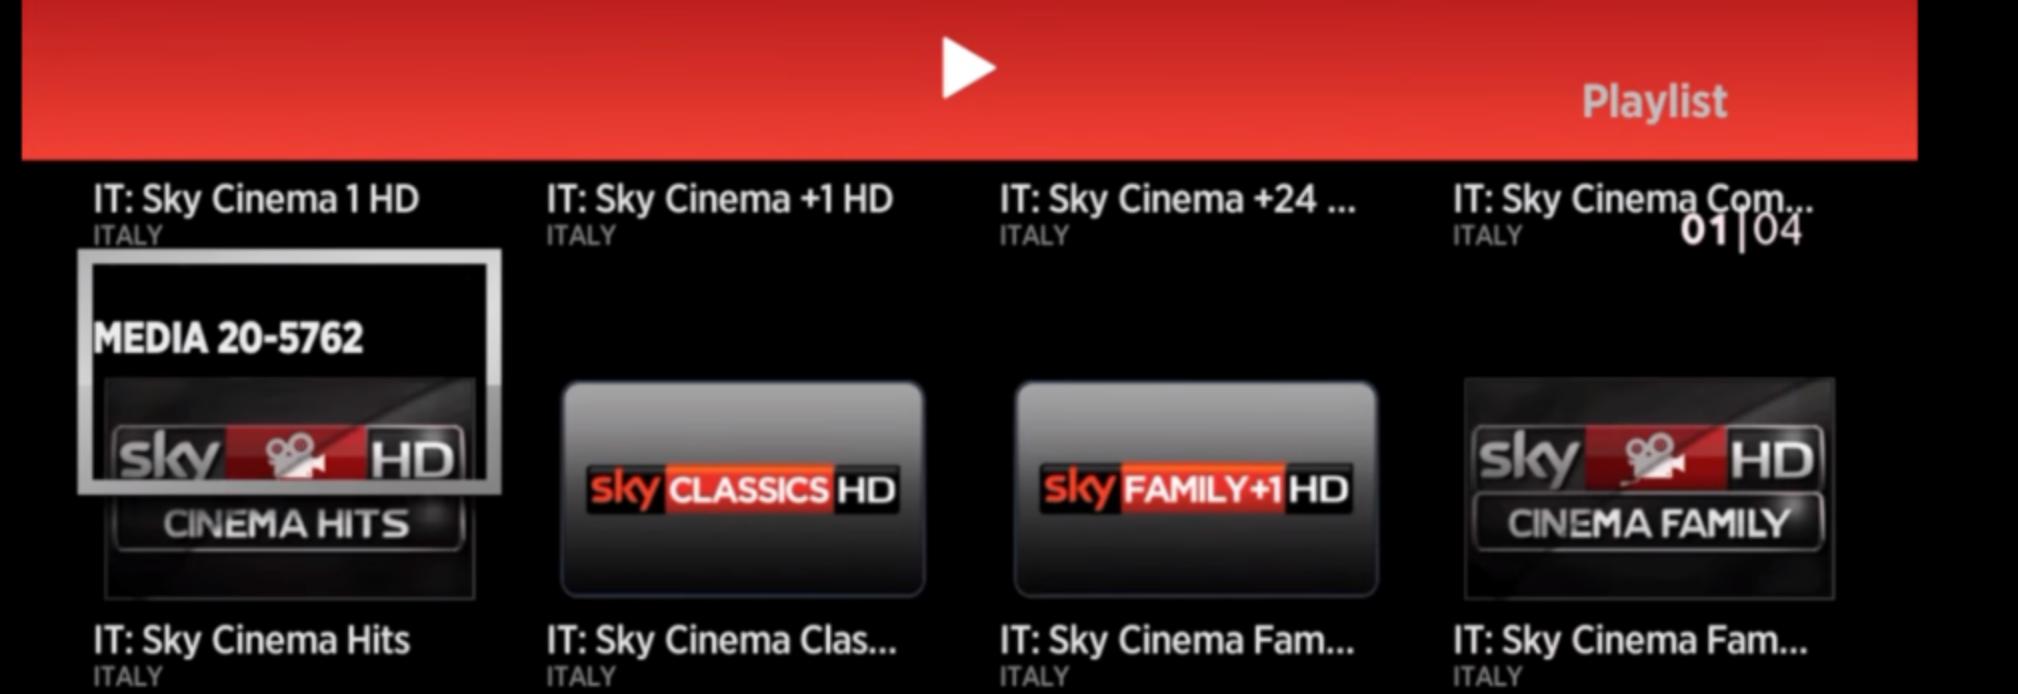 How to set up IPTV channel on Roku - مرکز آموزش - IPTVLocal Premium